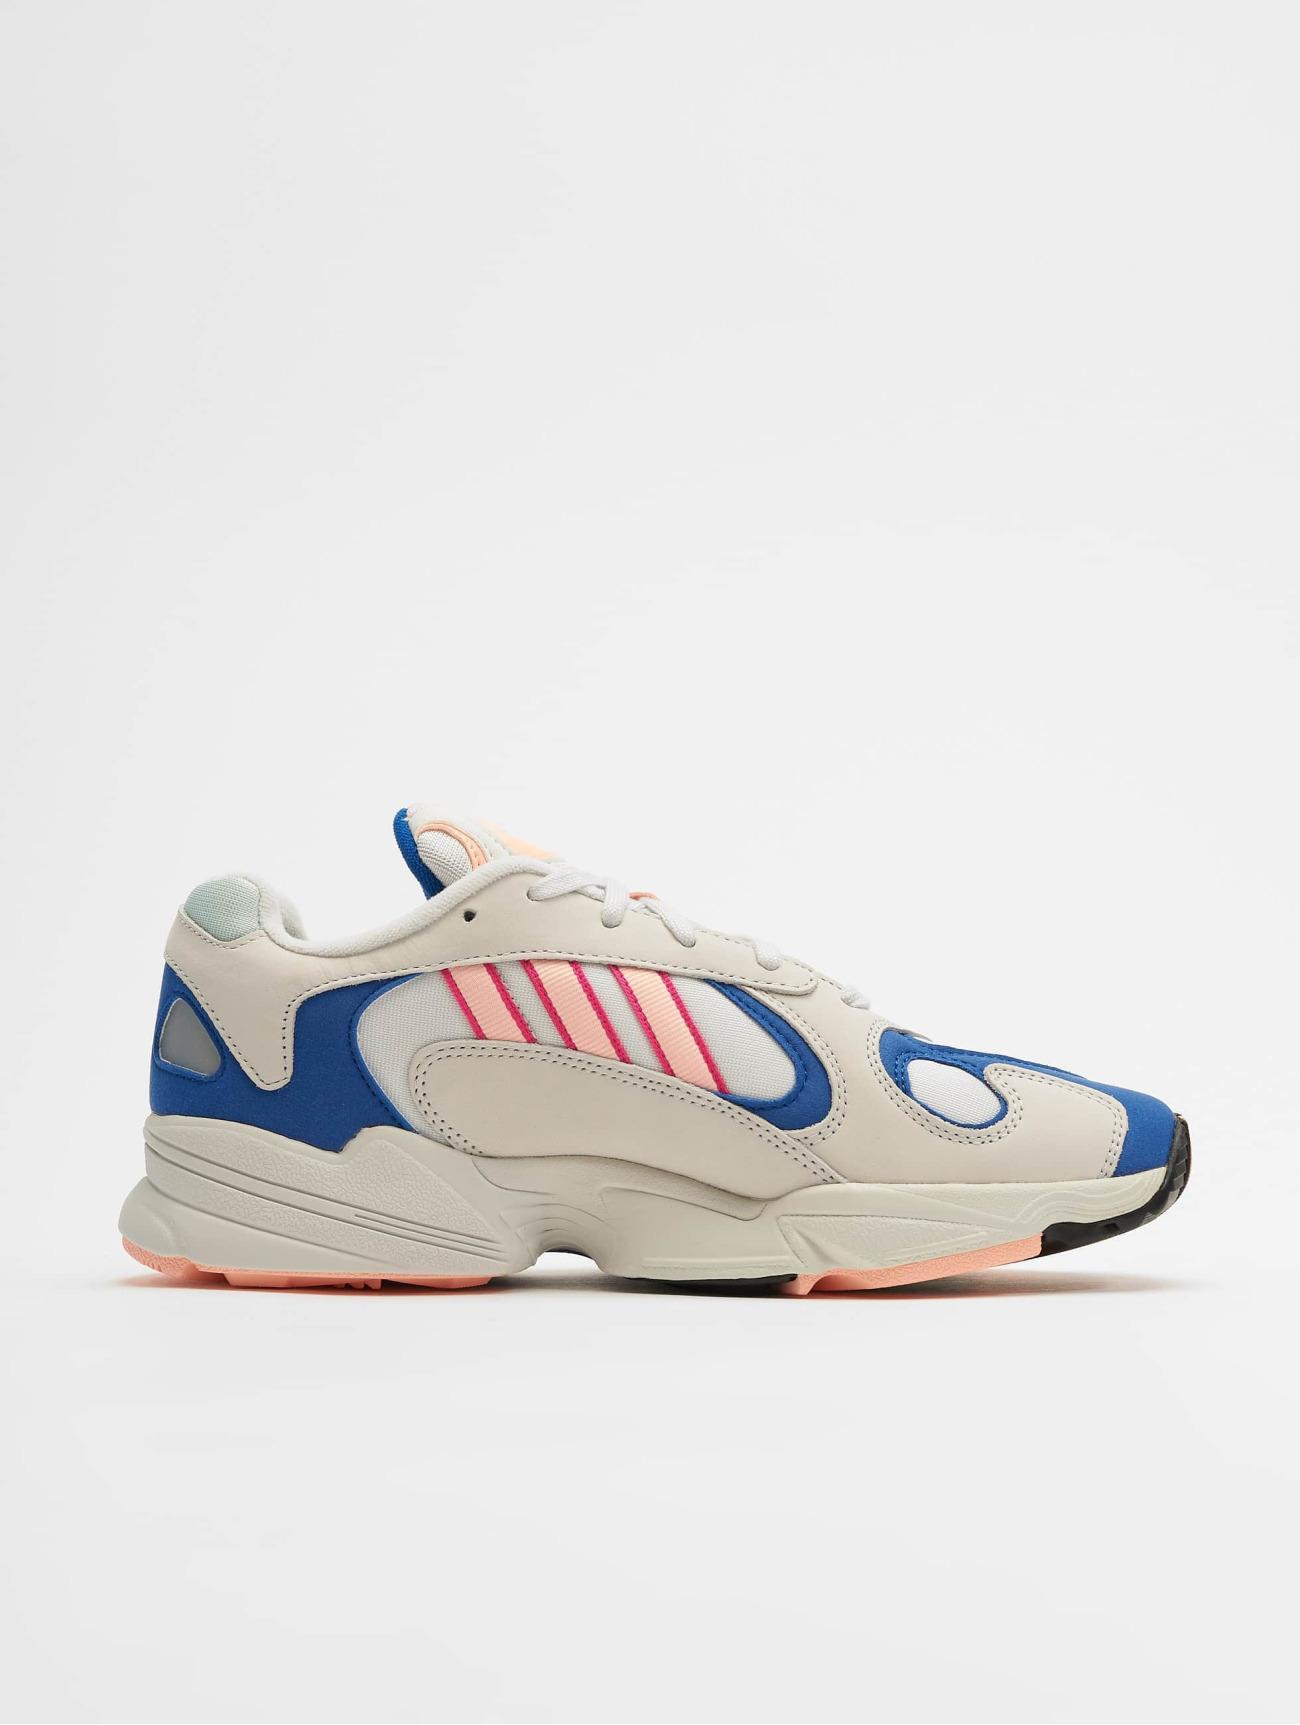 adidas Originals Yung-1 blanc Homme Baskets 671858 Homme Chaussures